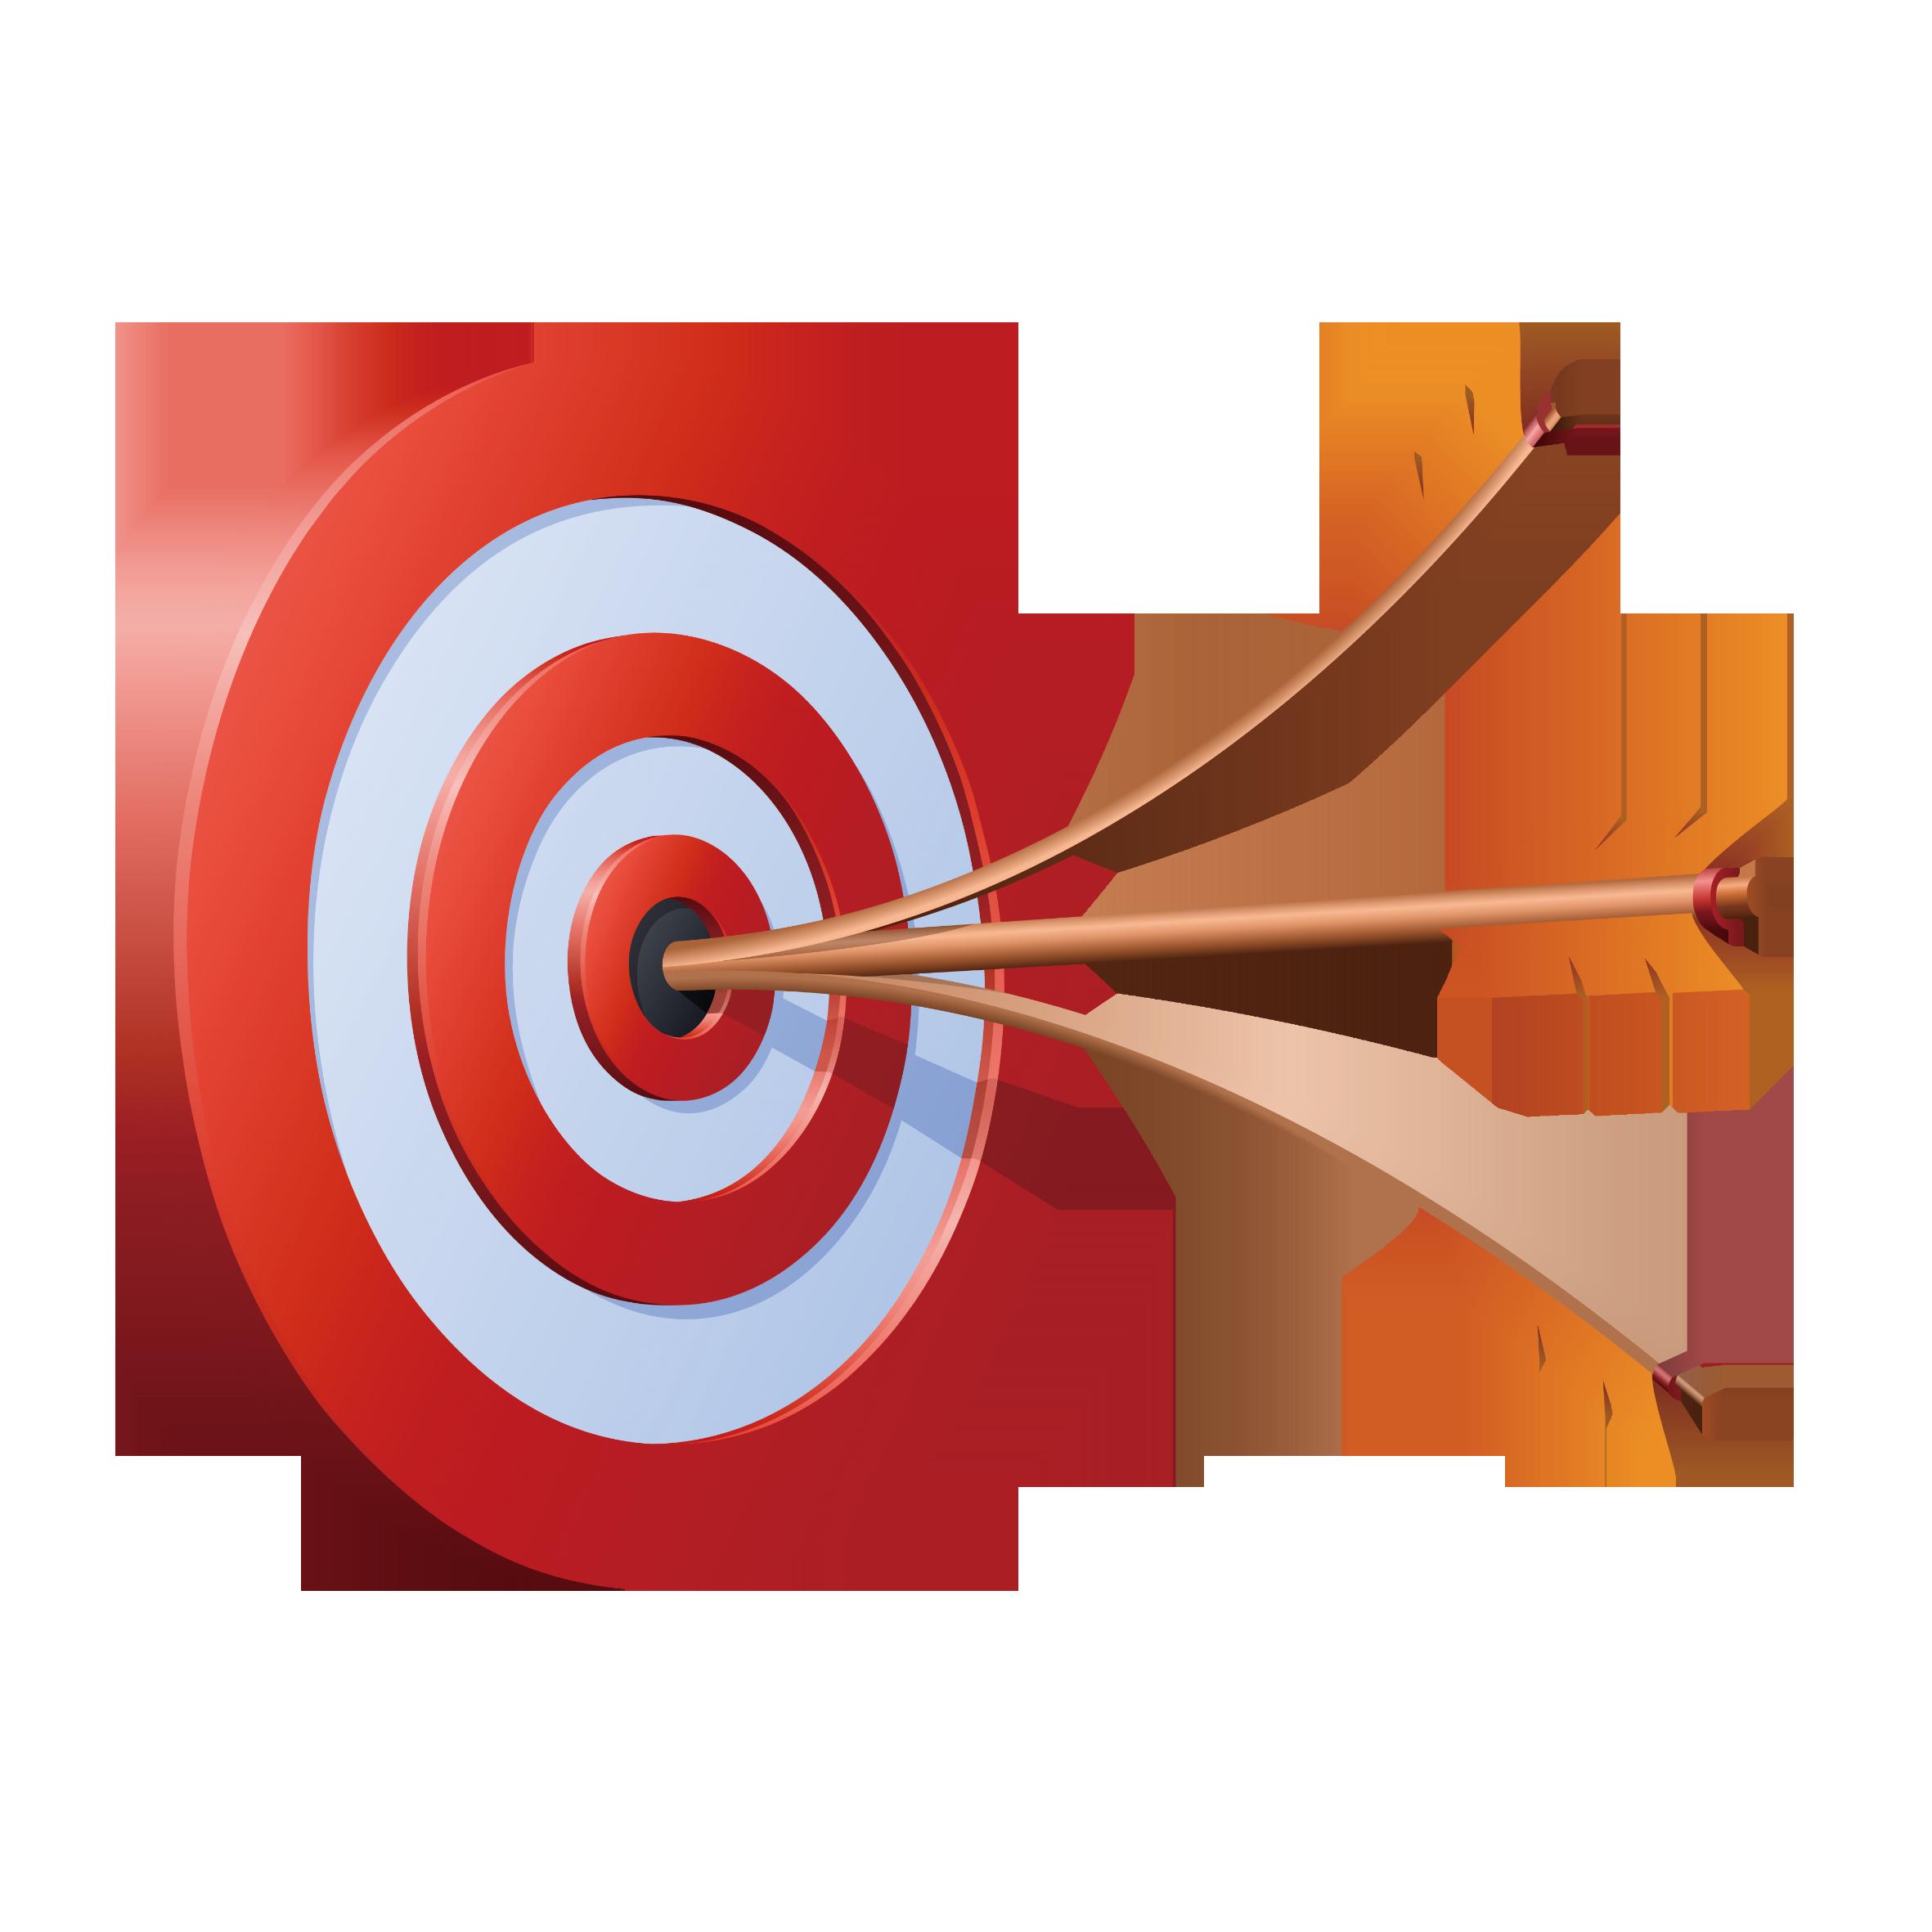 2362x2362 Shooting Target Bullseye Clip Art